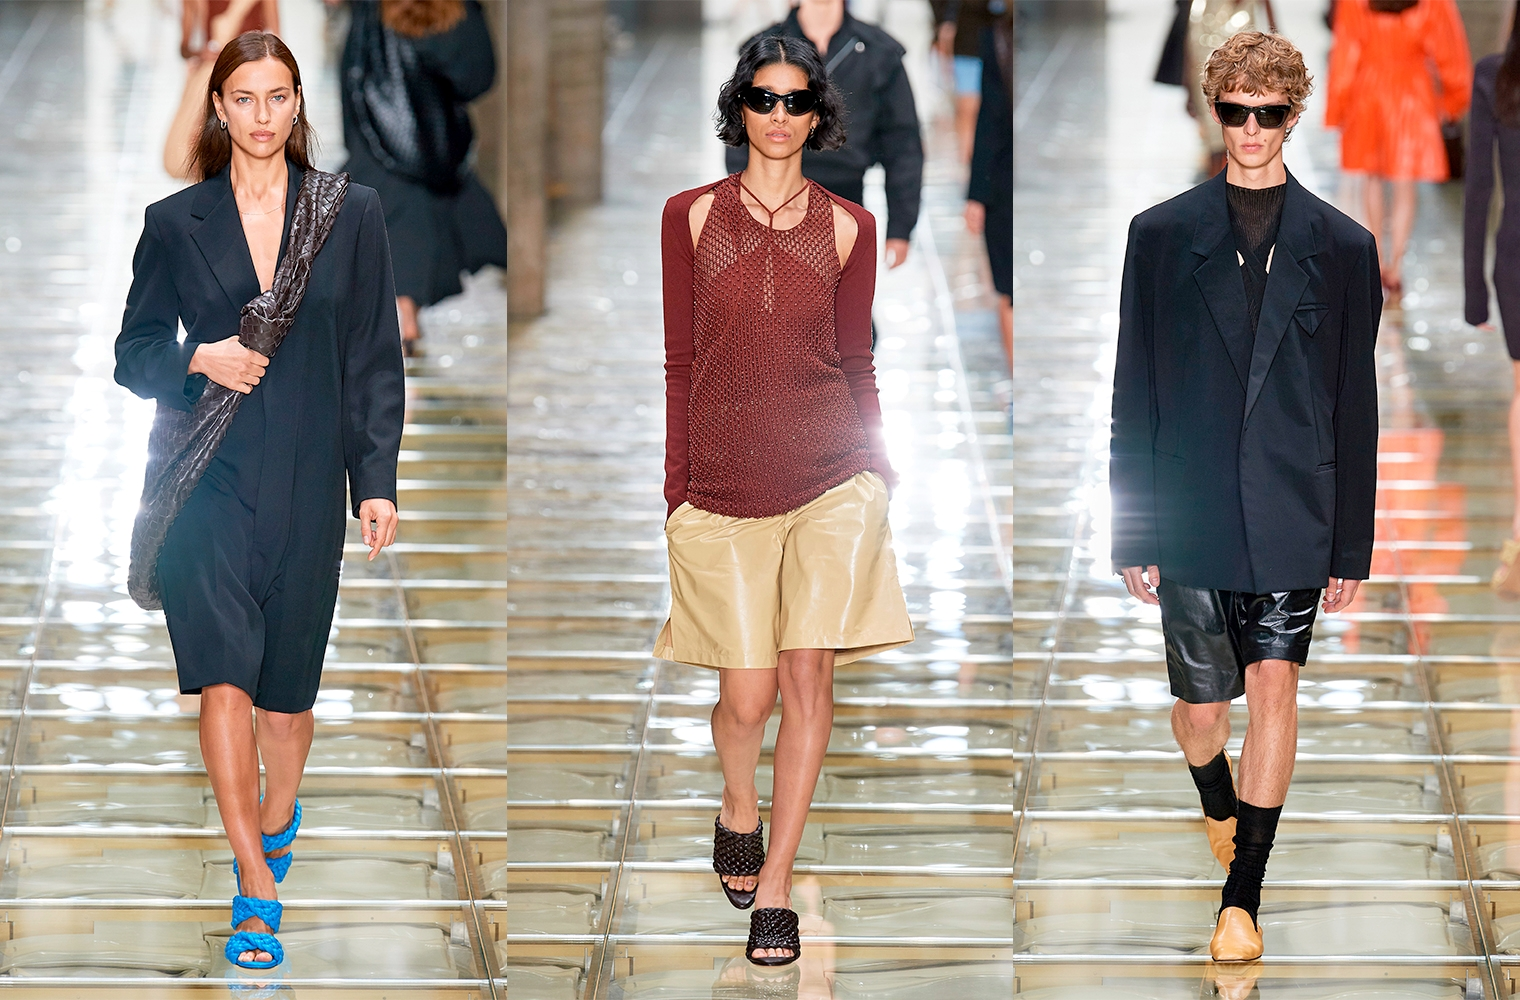 Bottega Veneta Spring/Summer 2020 Ready-to-Wear